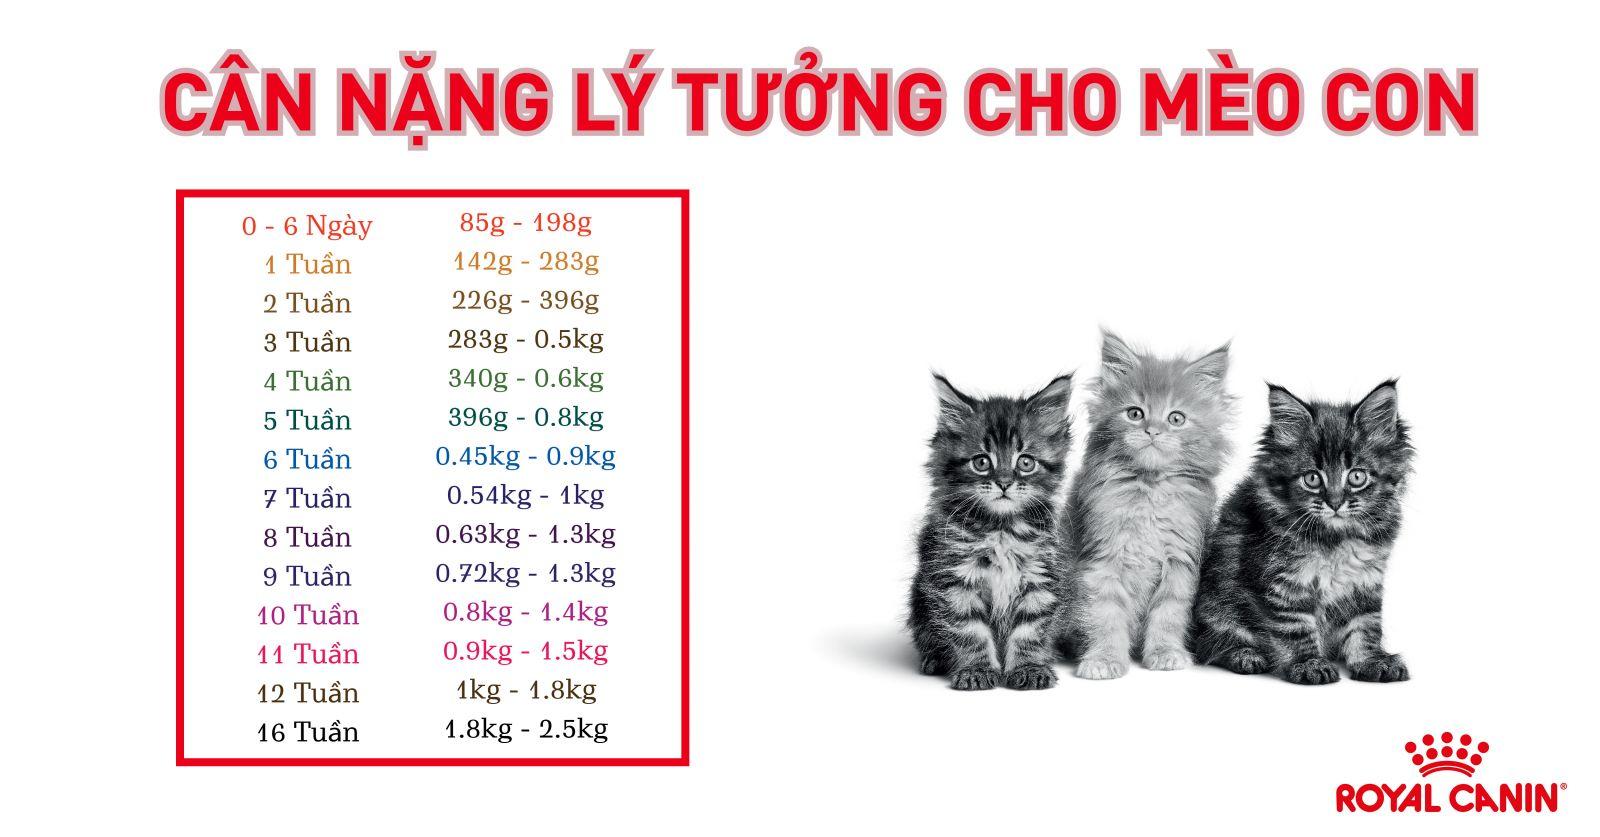 can-nang-ly-tuong-cho-meo-con